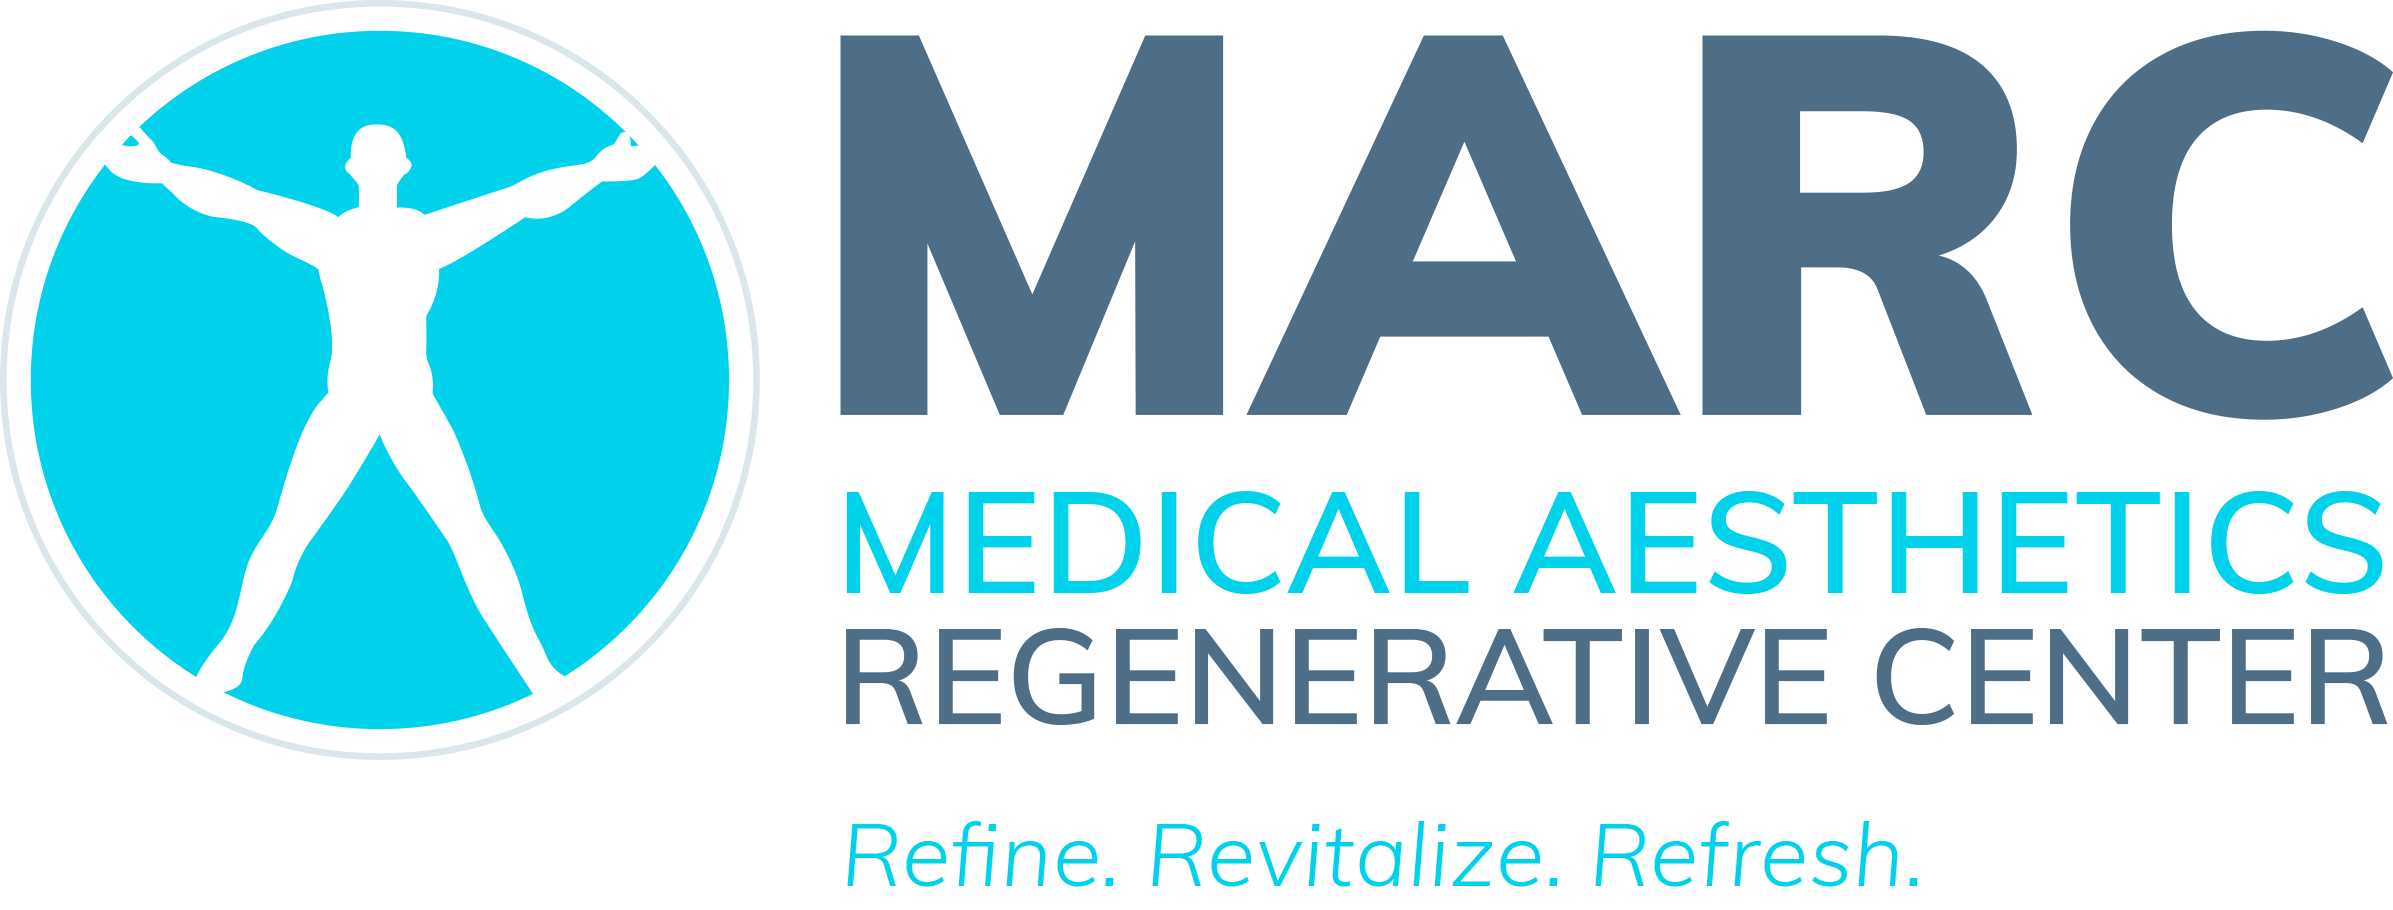 MEDICAL AESTHETICS REGENERATIVE CENTER IN GASTONIA, NC